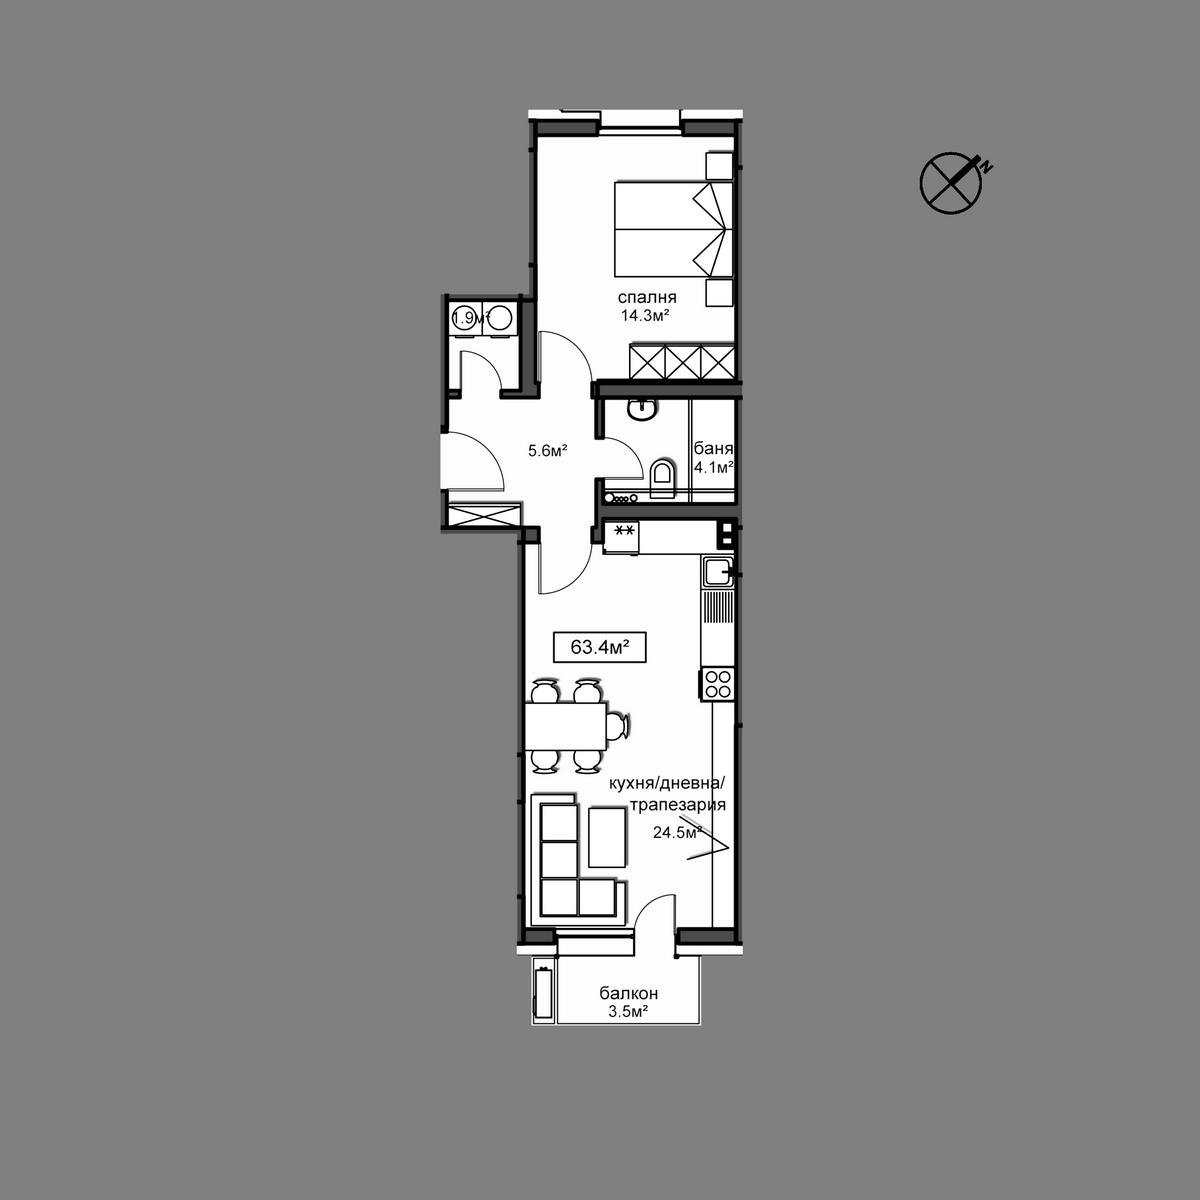 Продава апартамент - Апартамент А21